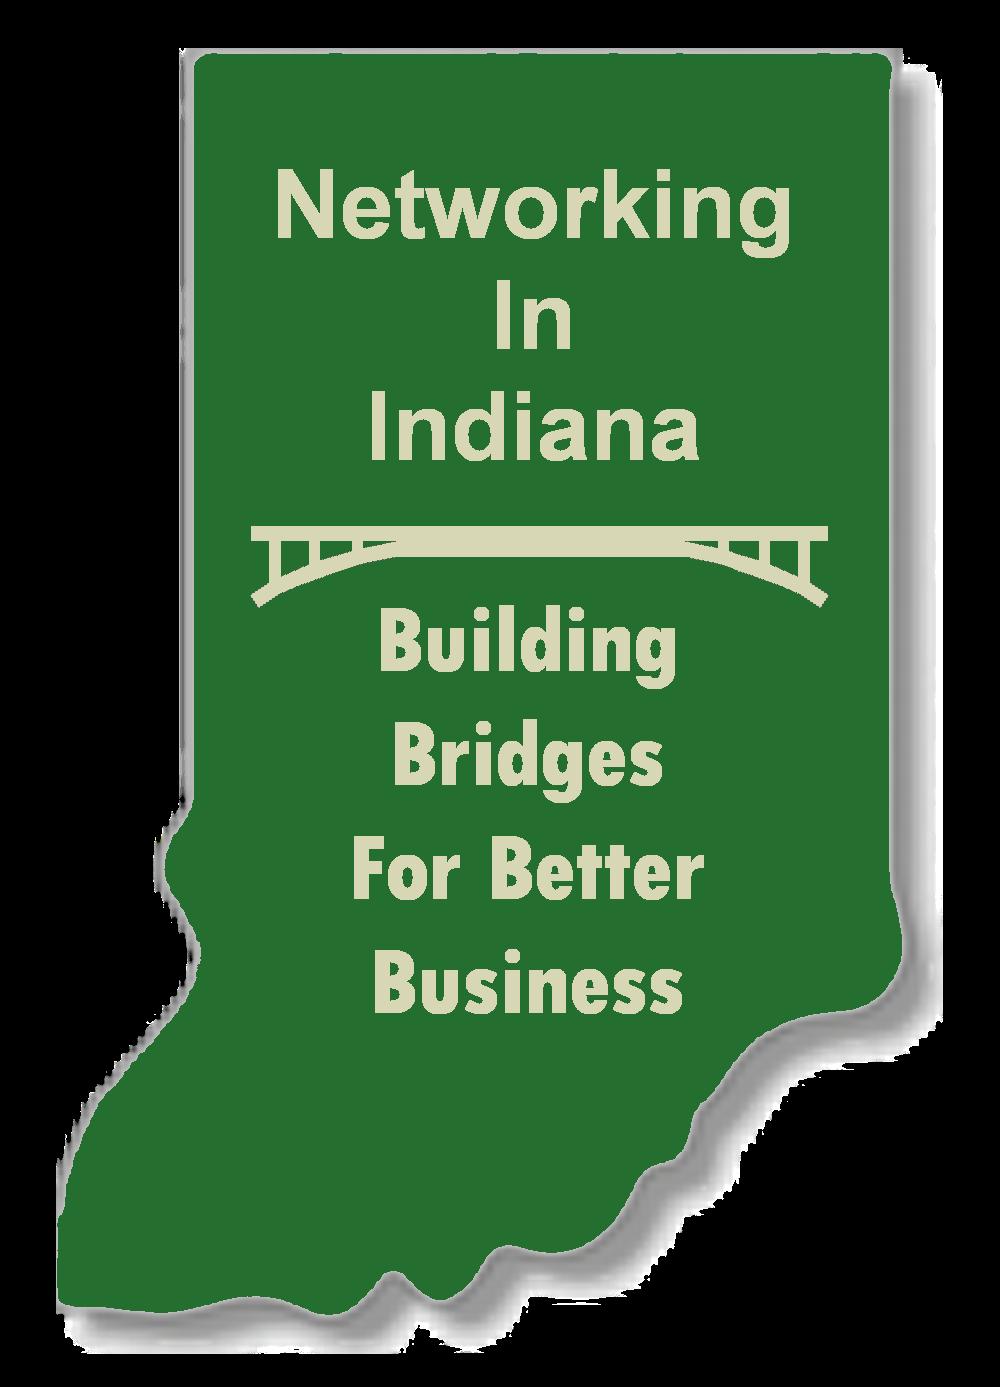 Quarterly Business After Hours Event Bridge building